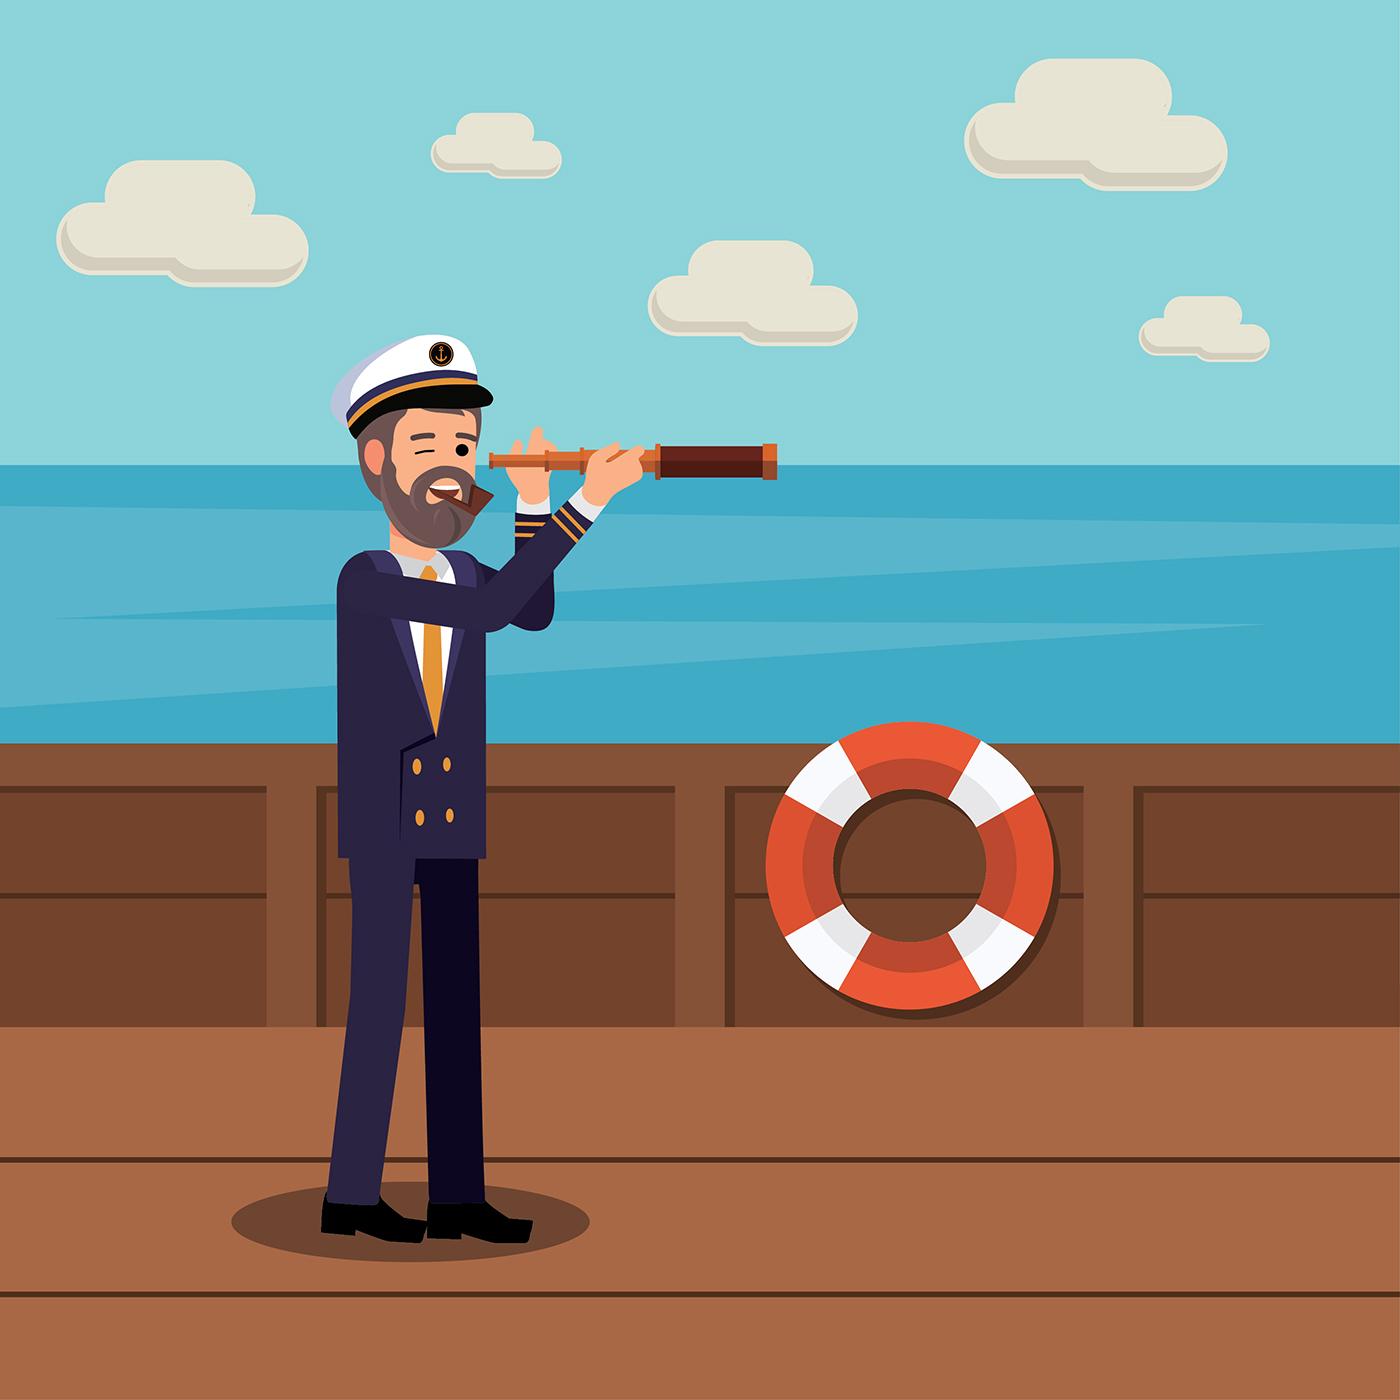 seaman illustration free vector download free vector art